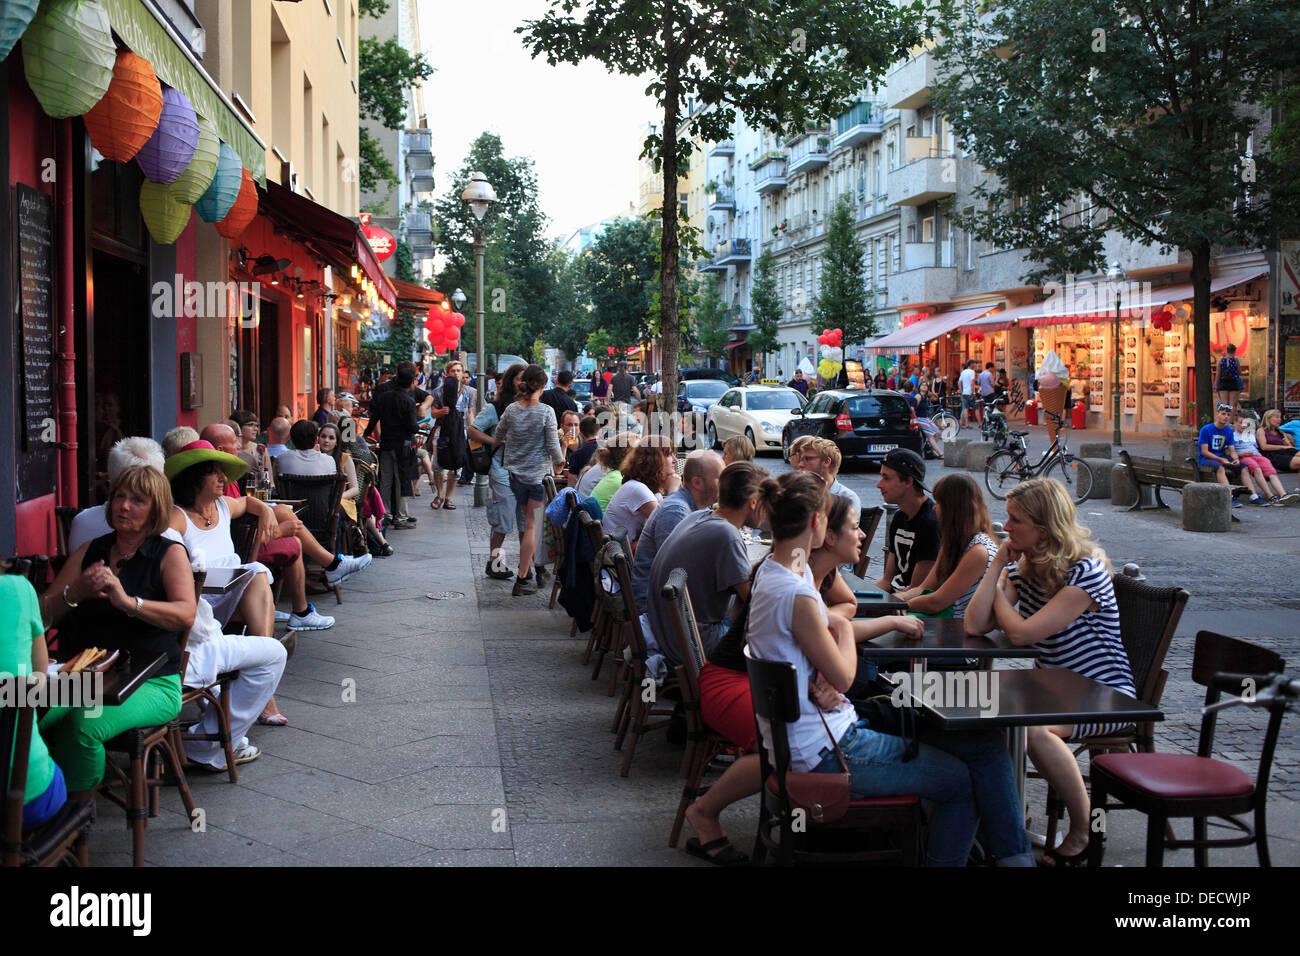 Outdoor Cafe Lights picture on stock photo berlin germany street restaurants in berlin kreuzberg 60519838 with Outdoor Cafe Lights, Outdoor Lighting ideas 7d1c3ceb392c6ed47307807bda07d05f